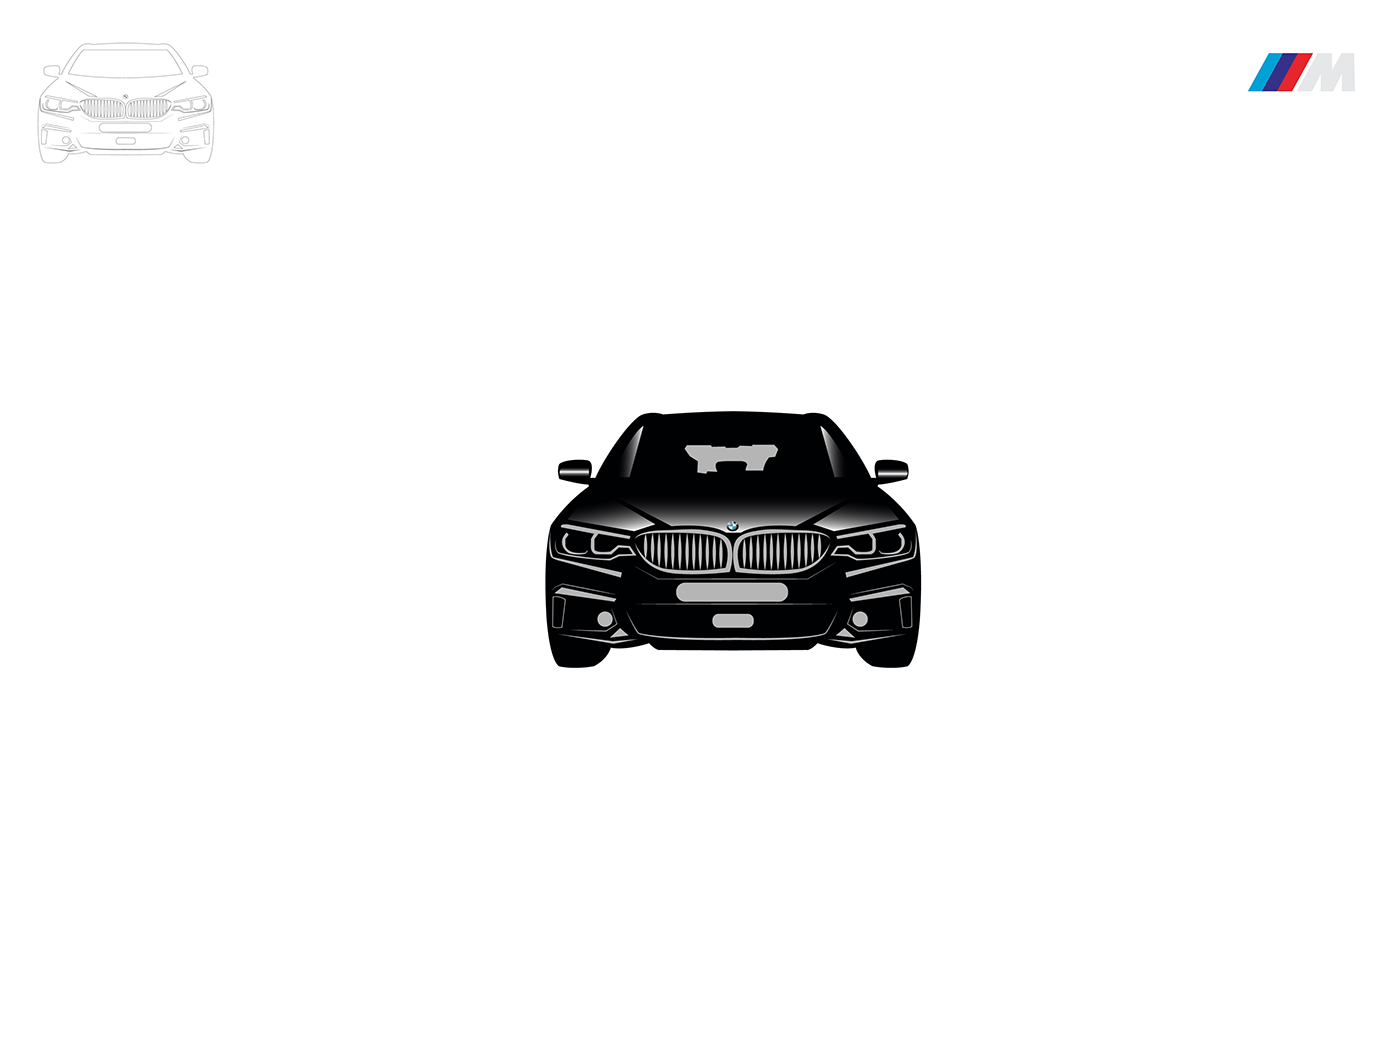 BMW M3 ILLUSTRATION  black design Auto automobile Drawing  car front